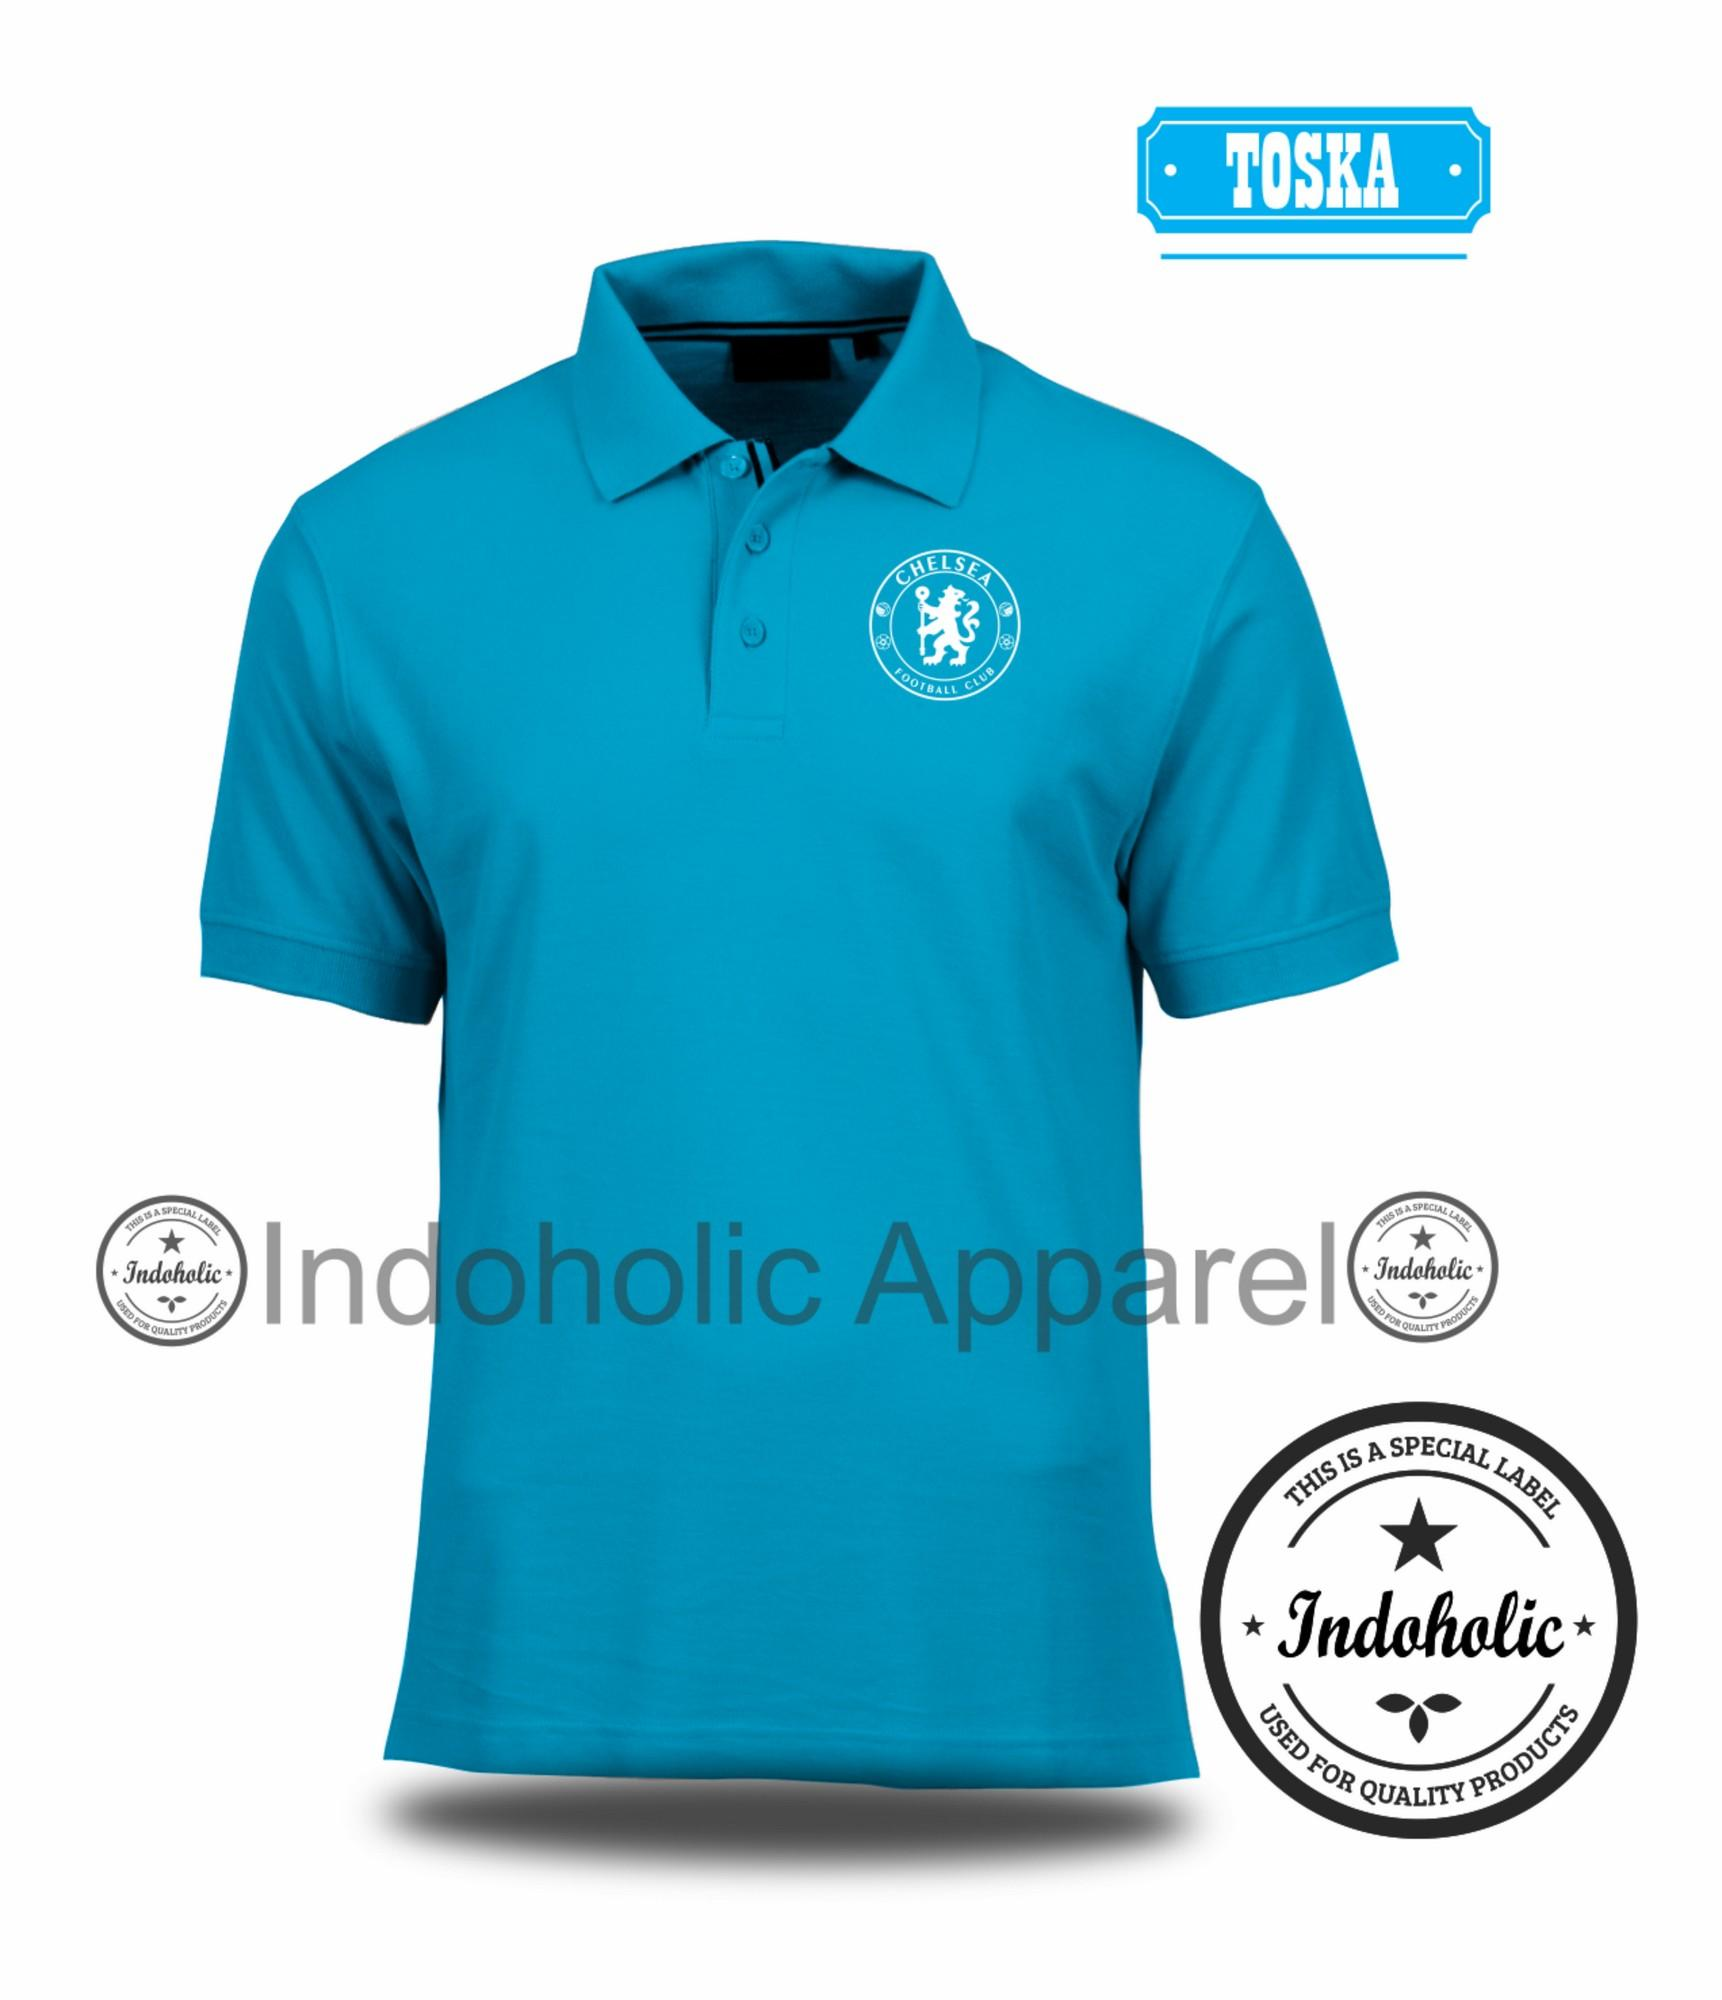 Polo Shirt Kaos Distro Football Club Liga Inggris England League klub sepak bola Chelsea  Branded T-Shirt Fashion Pria Wanita Cowok Cewek Baju T-Shirt Jakarta Bandung Terbaru Jaman Now Kekinian Atasan Pakaian Polos Pendek Kerah Berkera